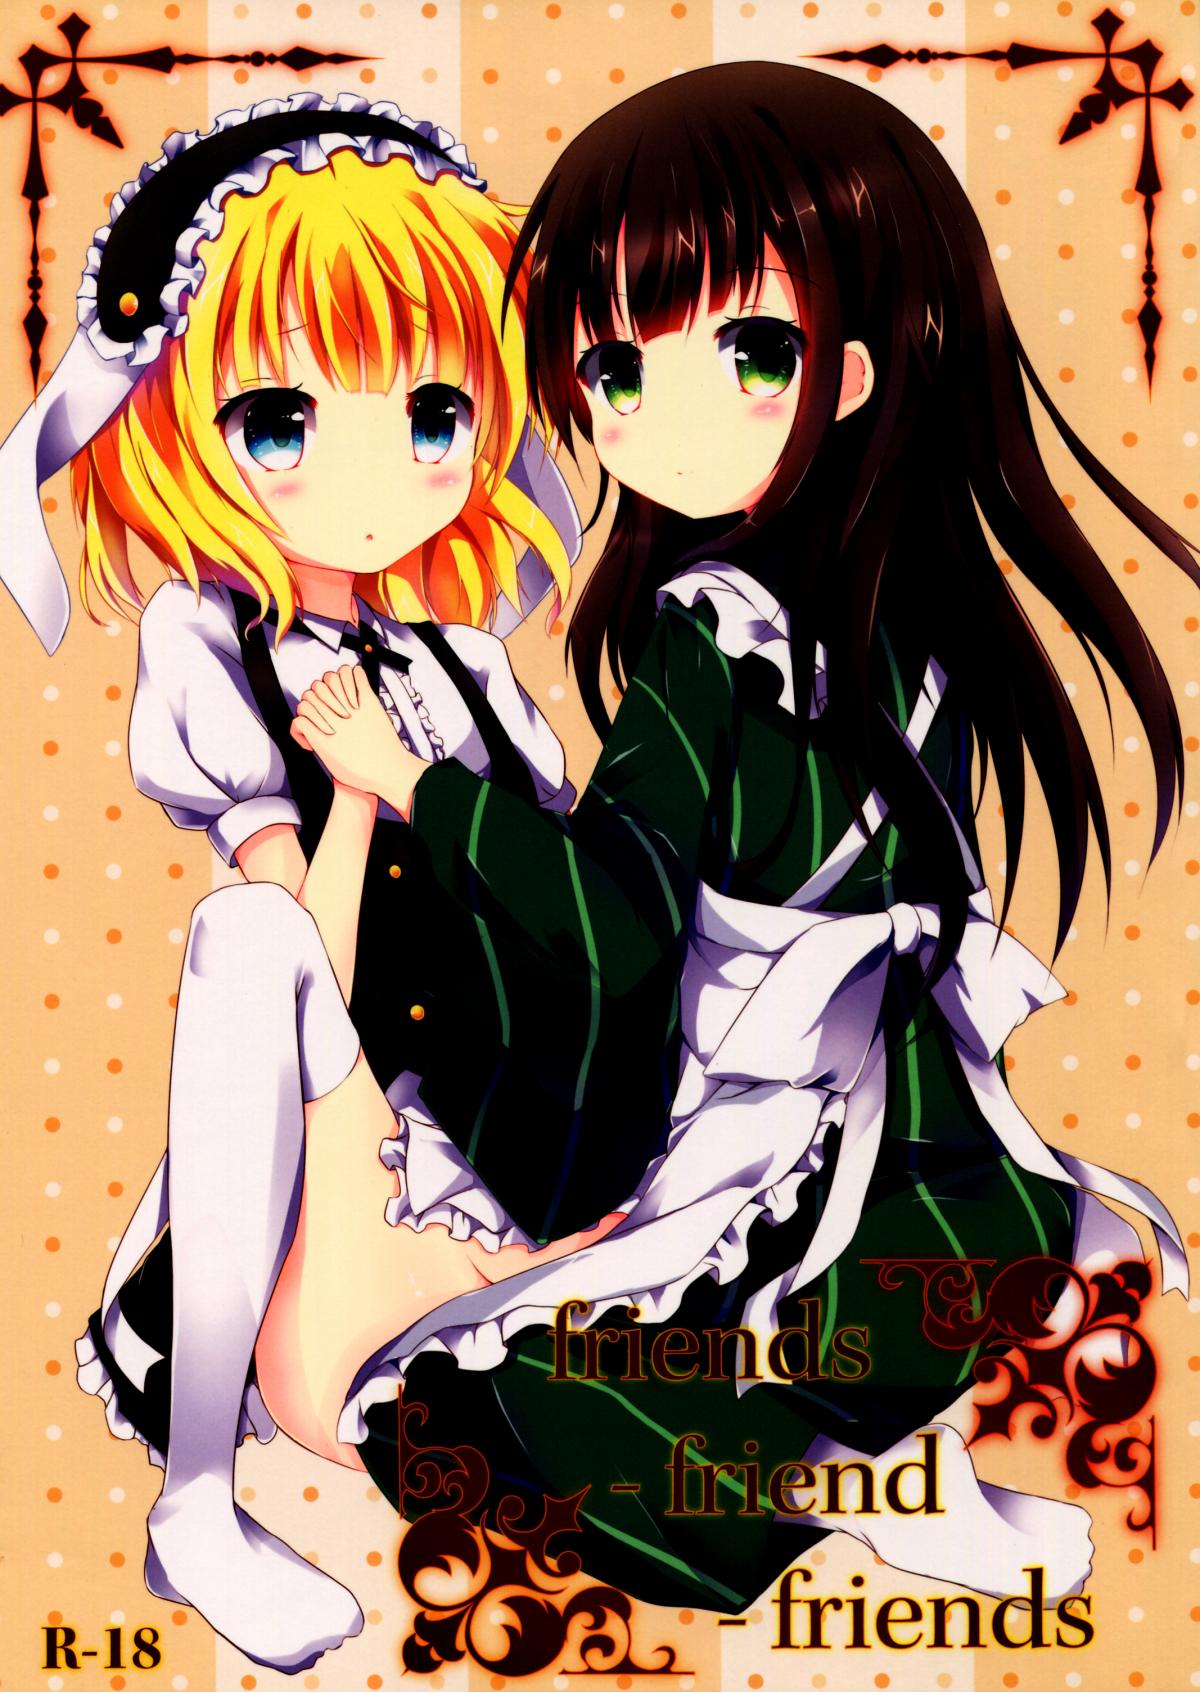 HentaiVN.net - Ảnh 1 - friends-friend-friends (Gochuumon wa Usagi desu ka?) - Oneshot